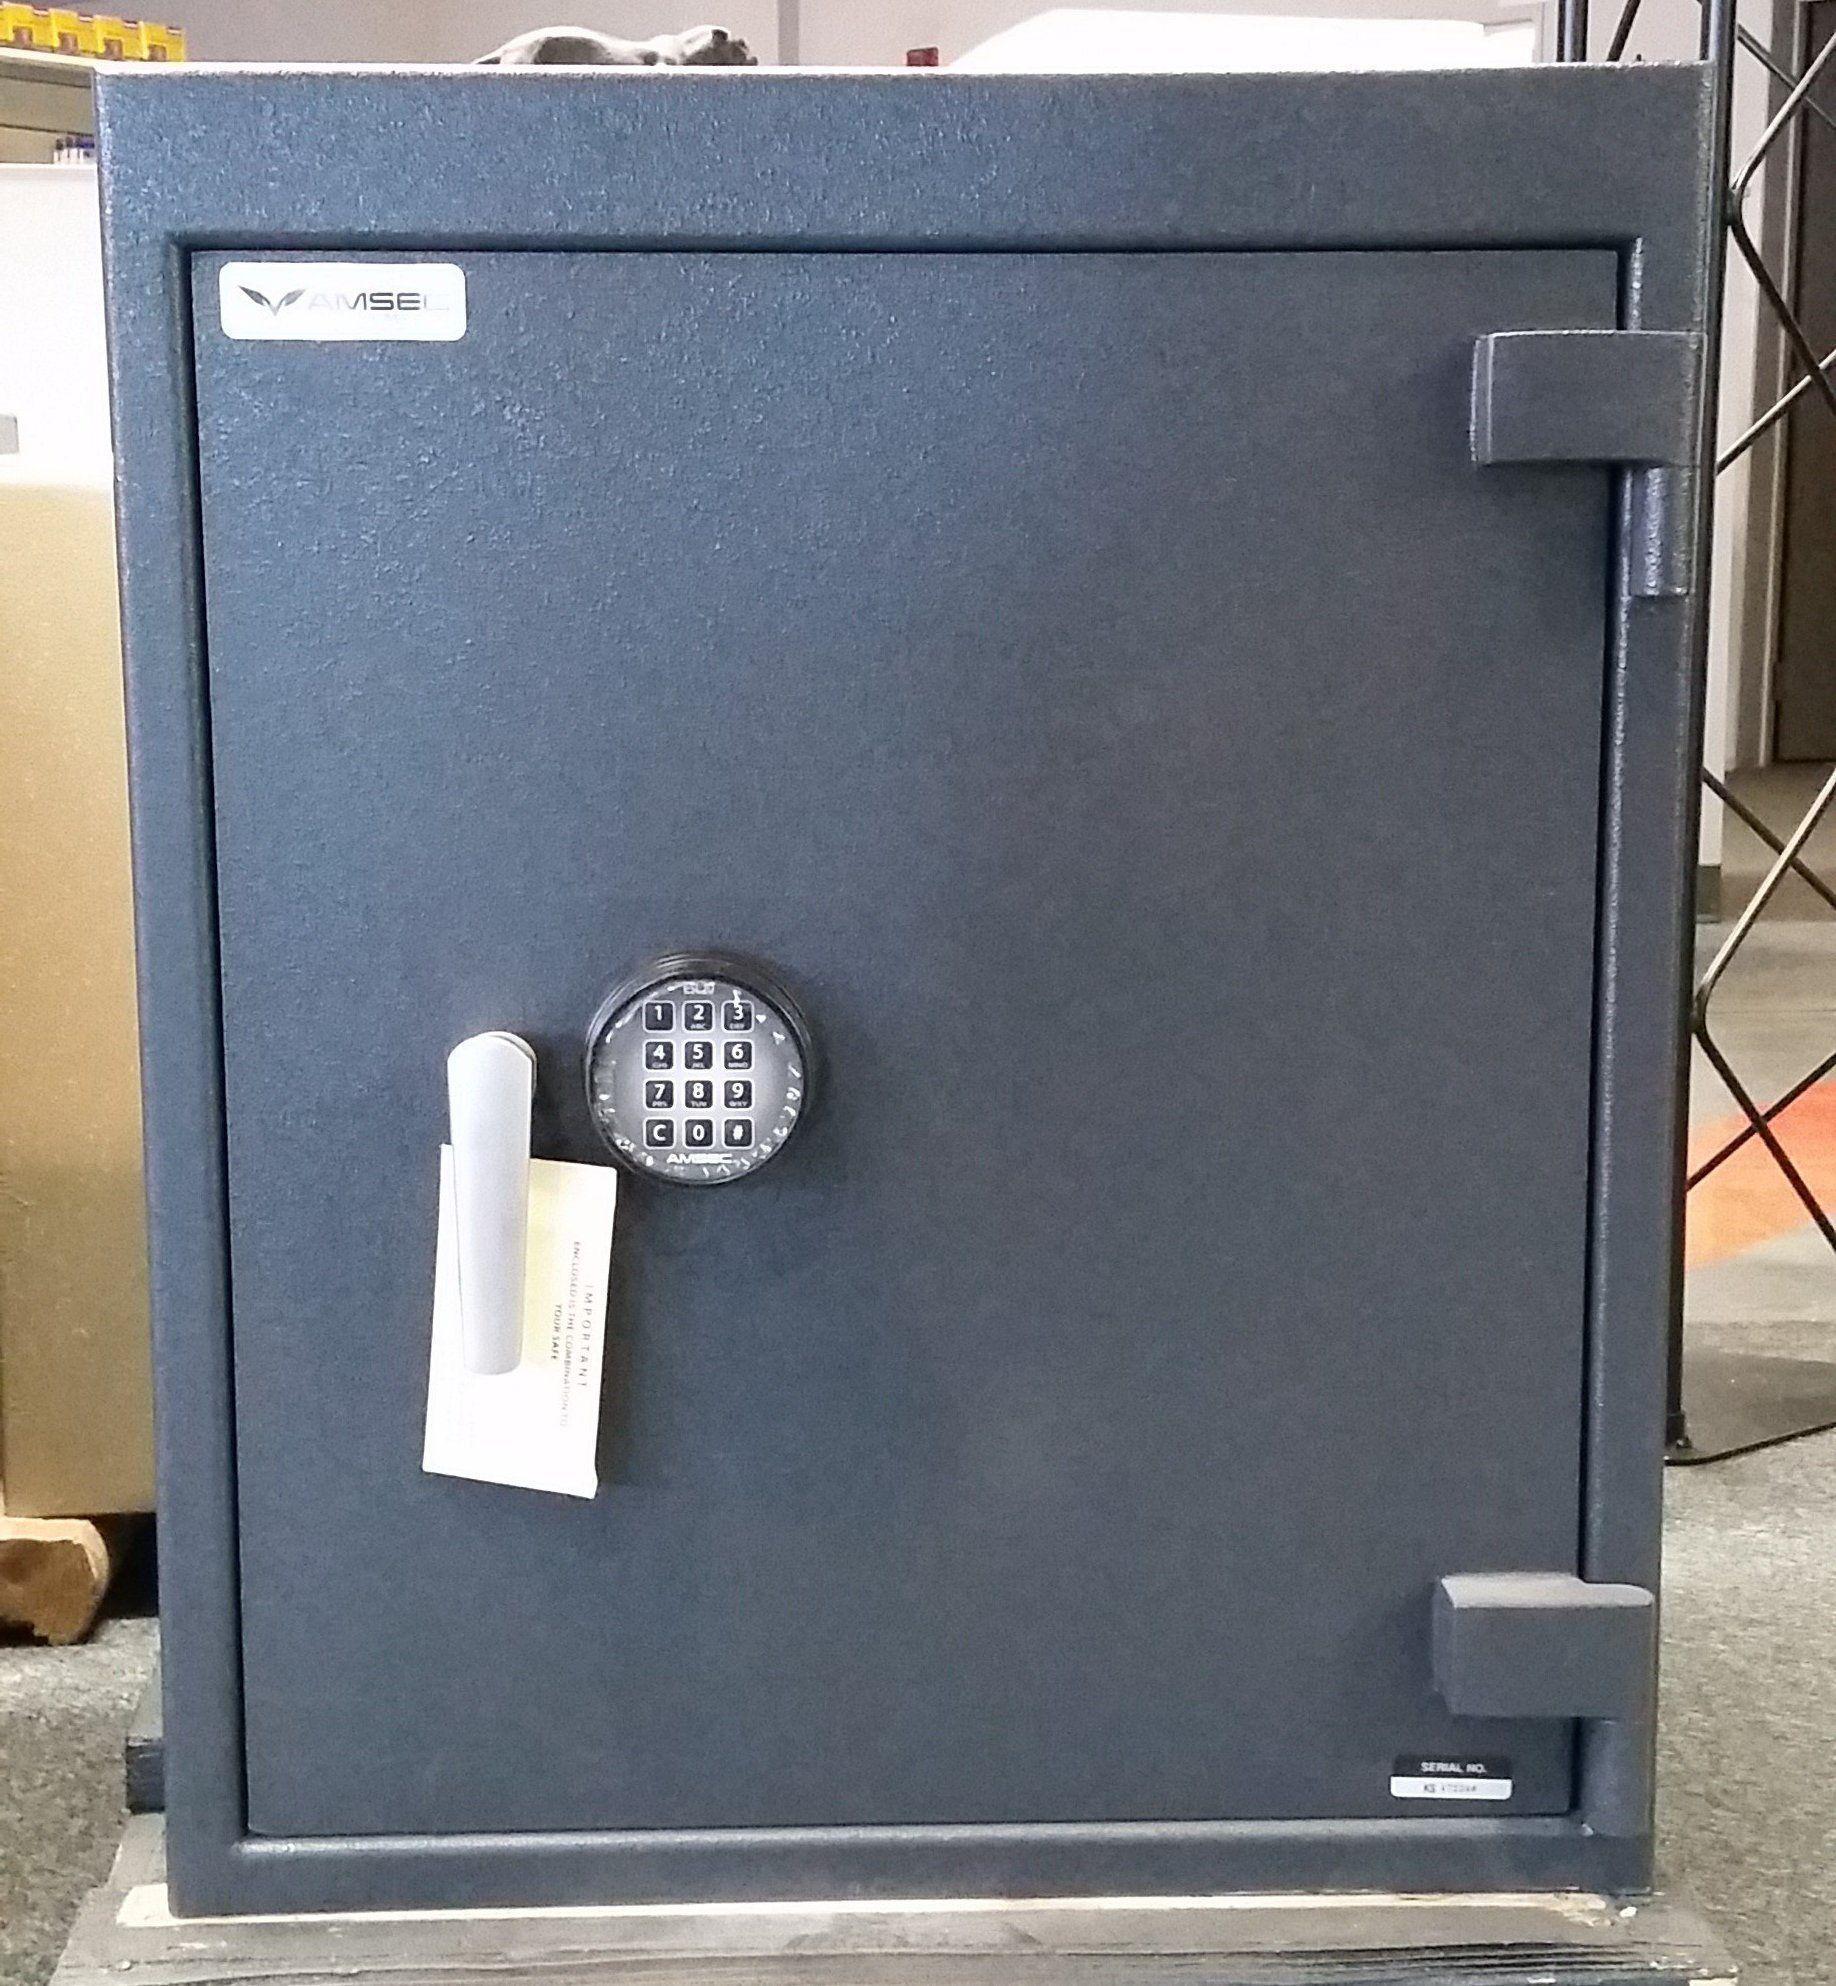 Tantra chair dimensions  AMSEC BWB BRate Wide Body Burglar Safe with ESLXL Digital